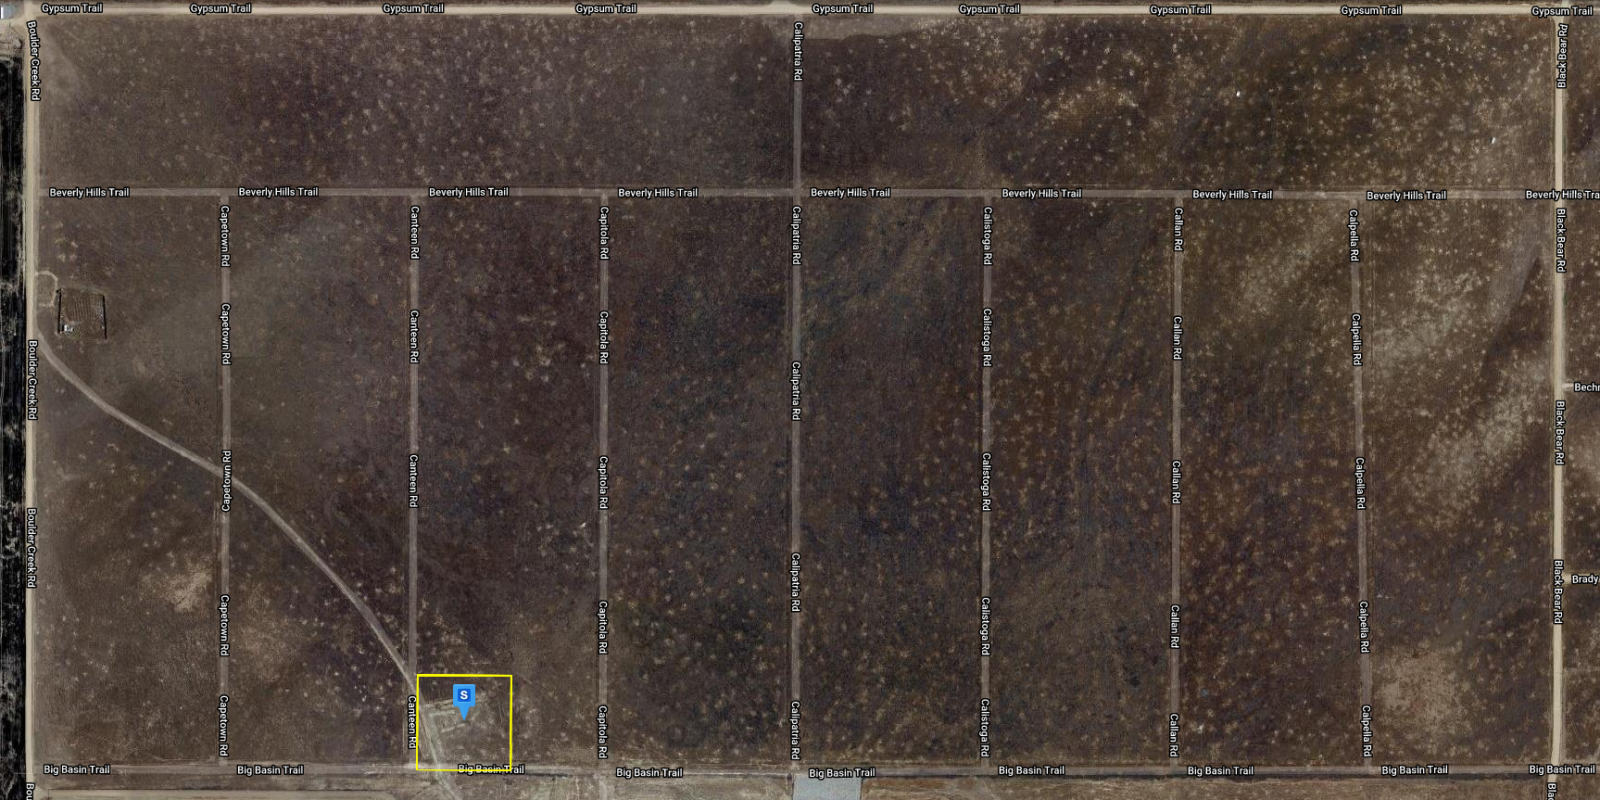 Wholesale Land